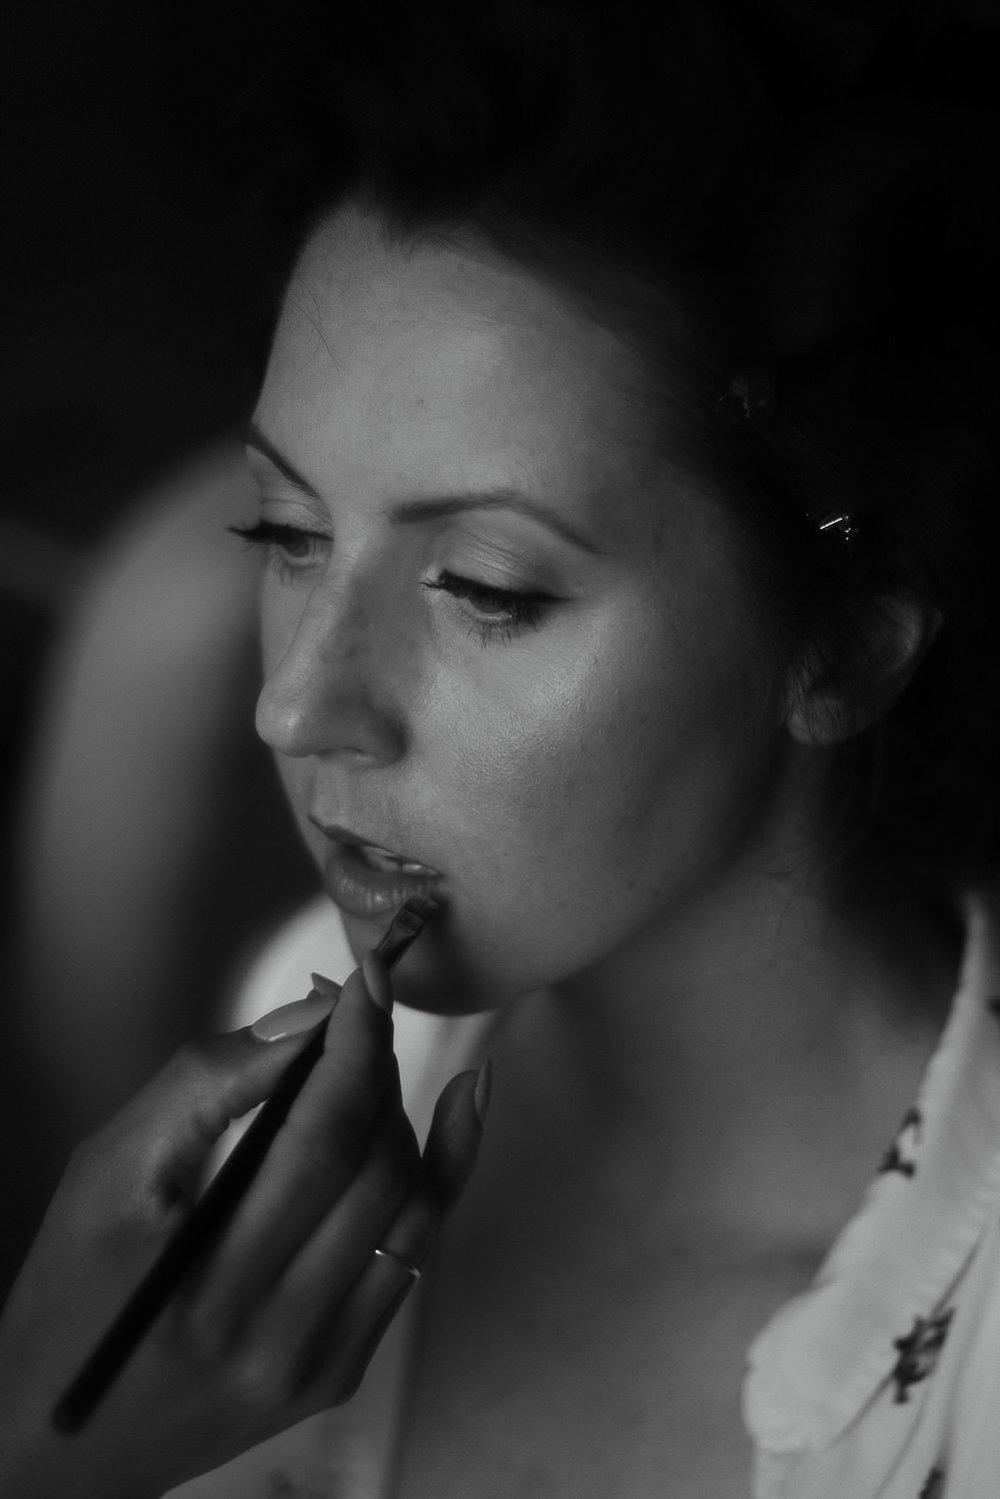 bruidsfotografie-trouwfotograaf-amsterdam-utrecht-mark-hadden-Laura-Craig-048-2.jpg